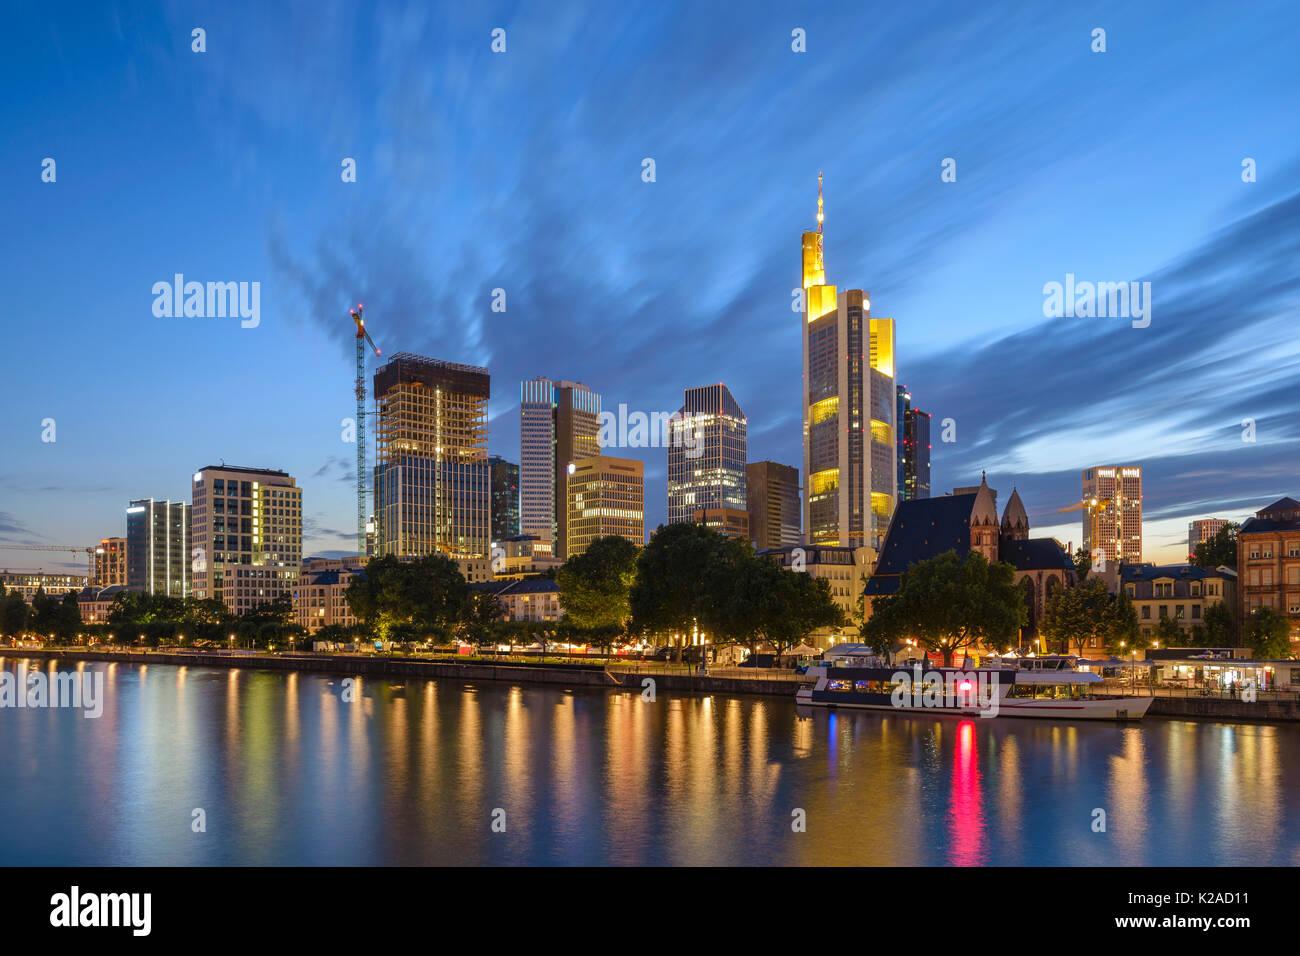 Frankfurt night city skyline at business district, Frankfurt, Germany - Stock Image